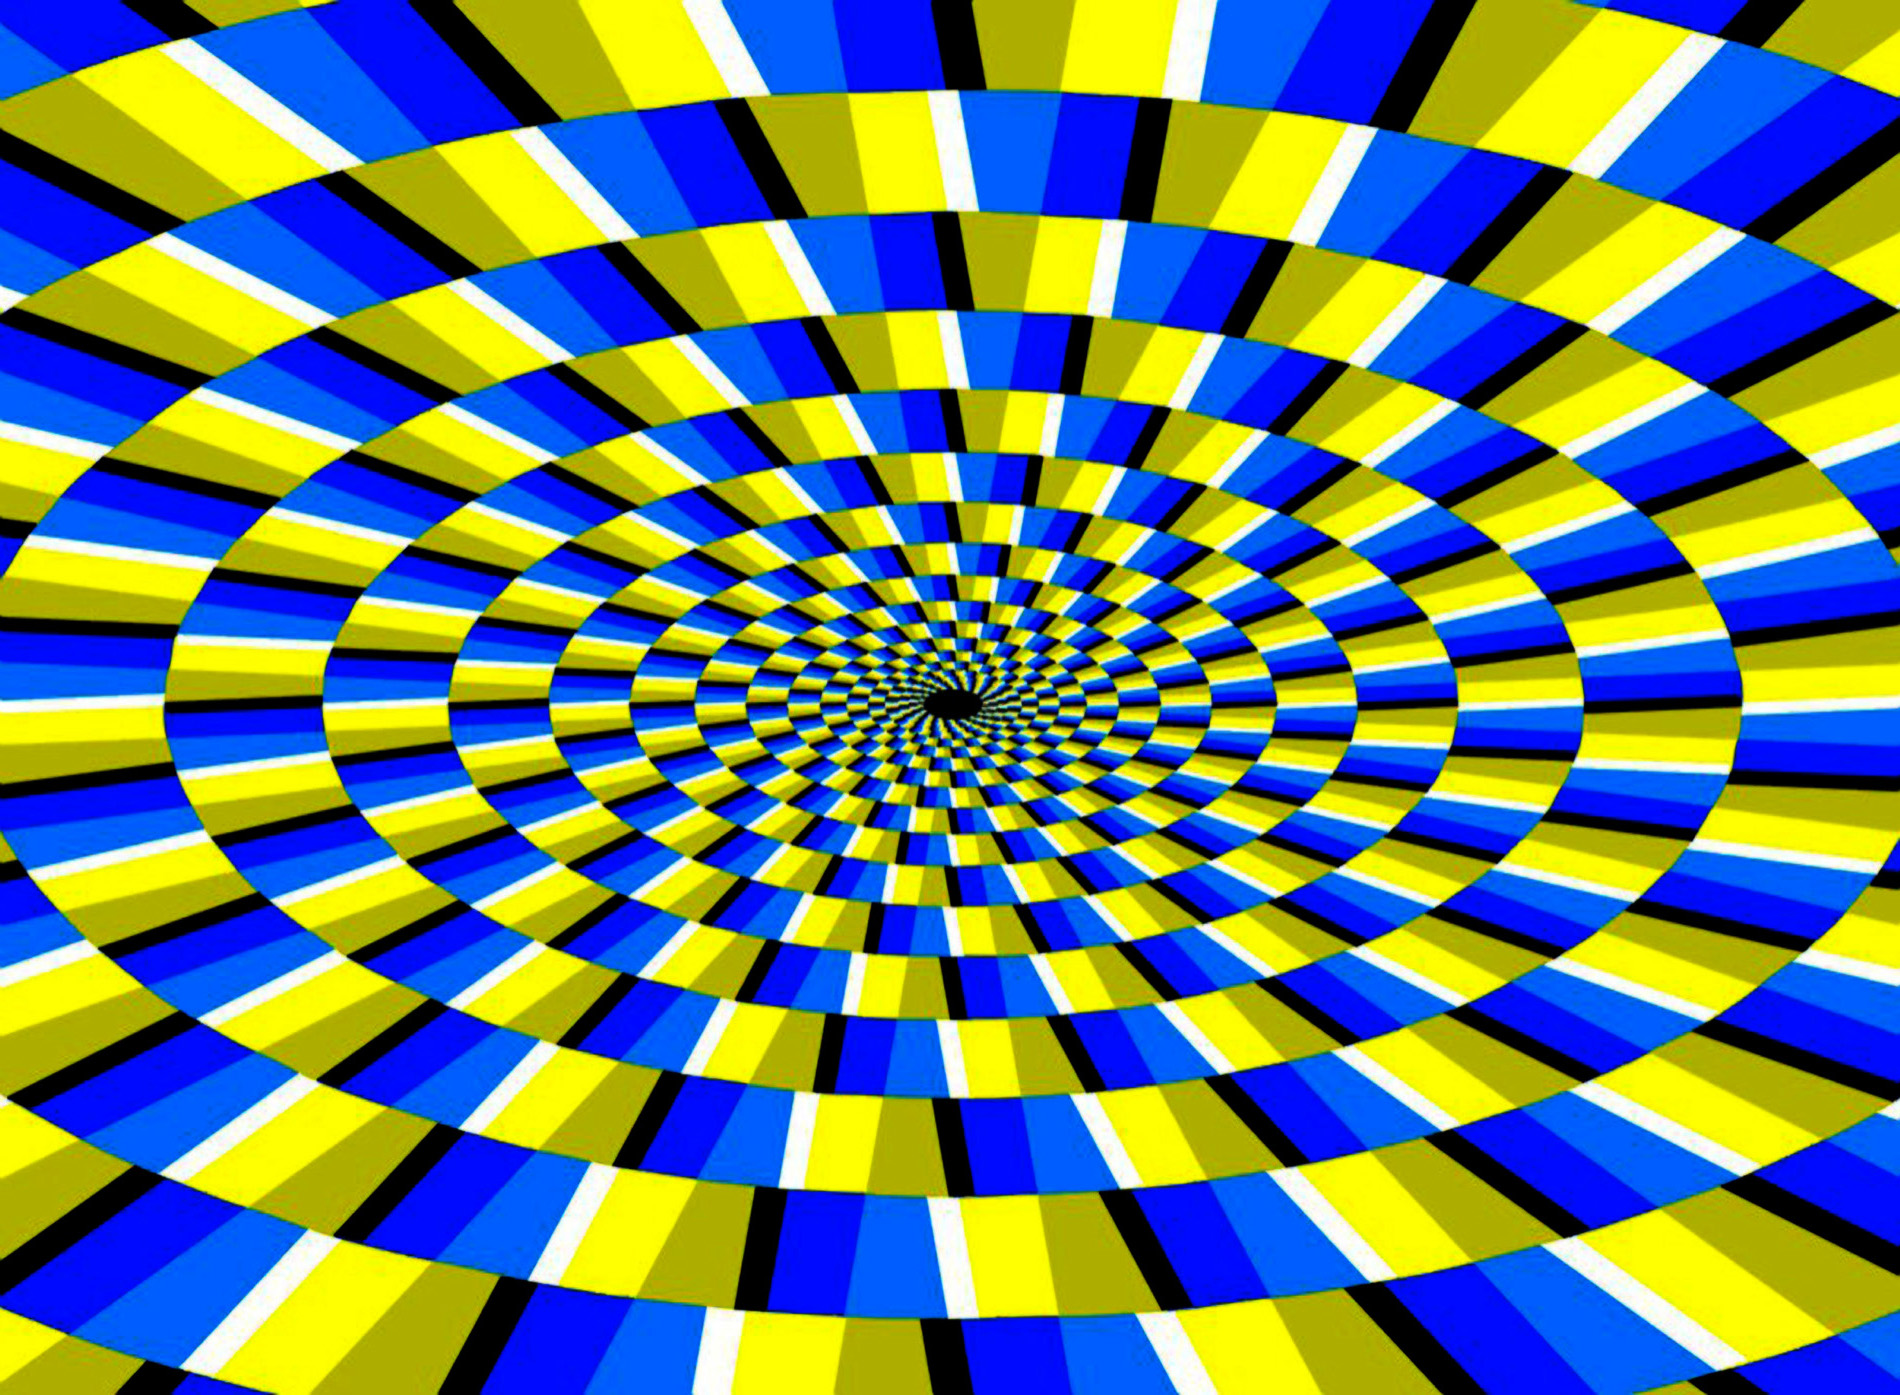 Optical illusion desktop wallpaper wallpapersafari - Optical illusion wallpaper hd ...